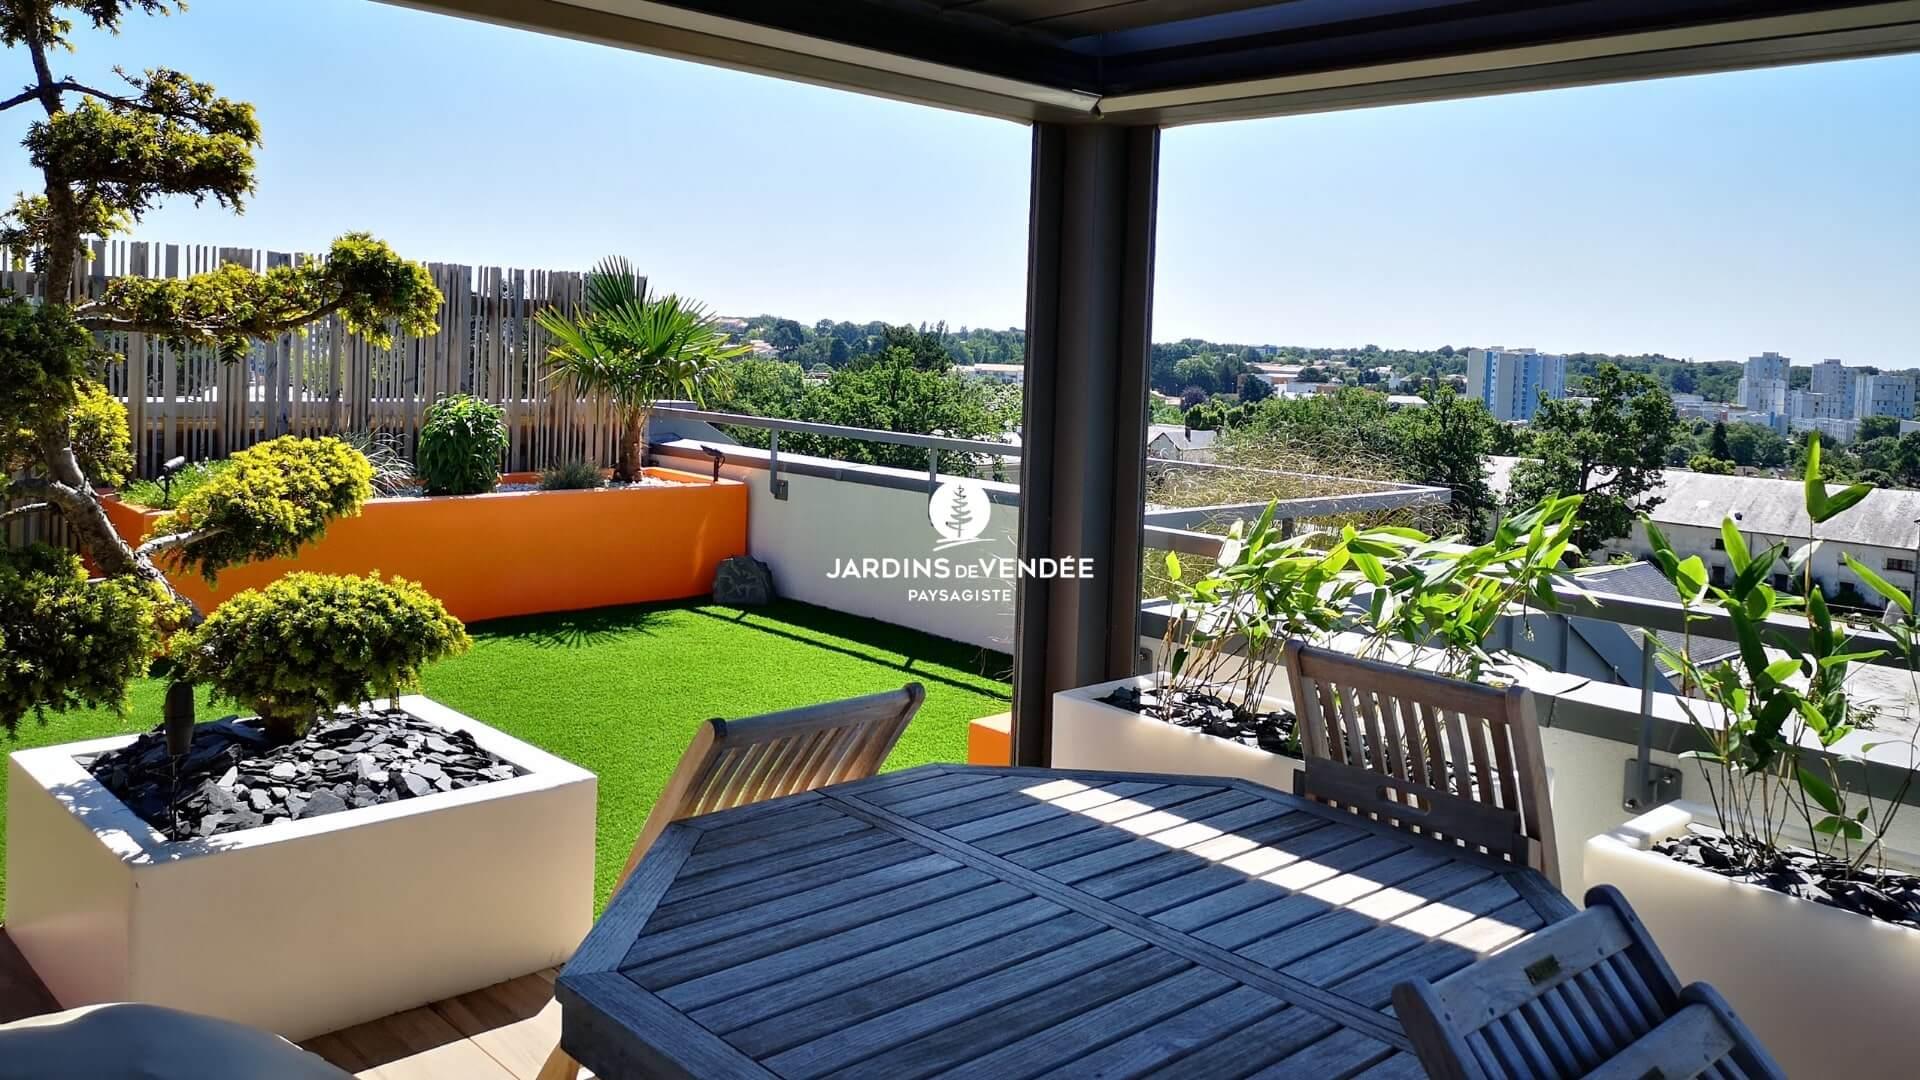 jardinsdevendee-realisations-amenagement-balcon(7)